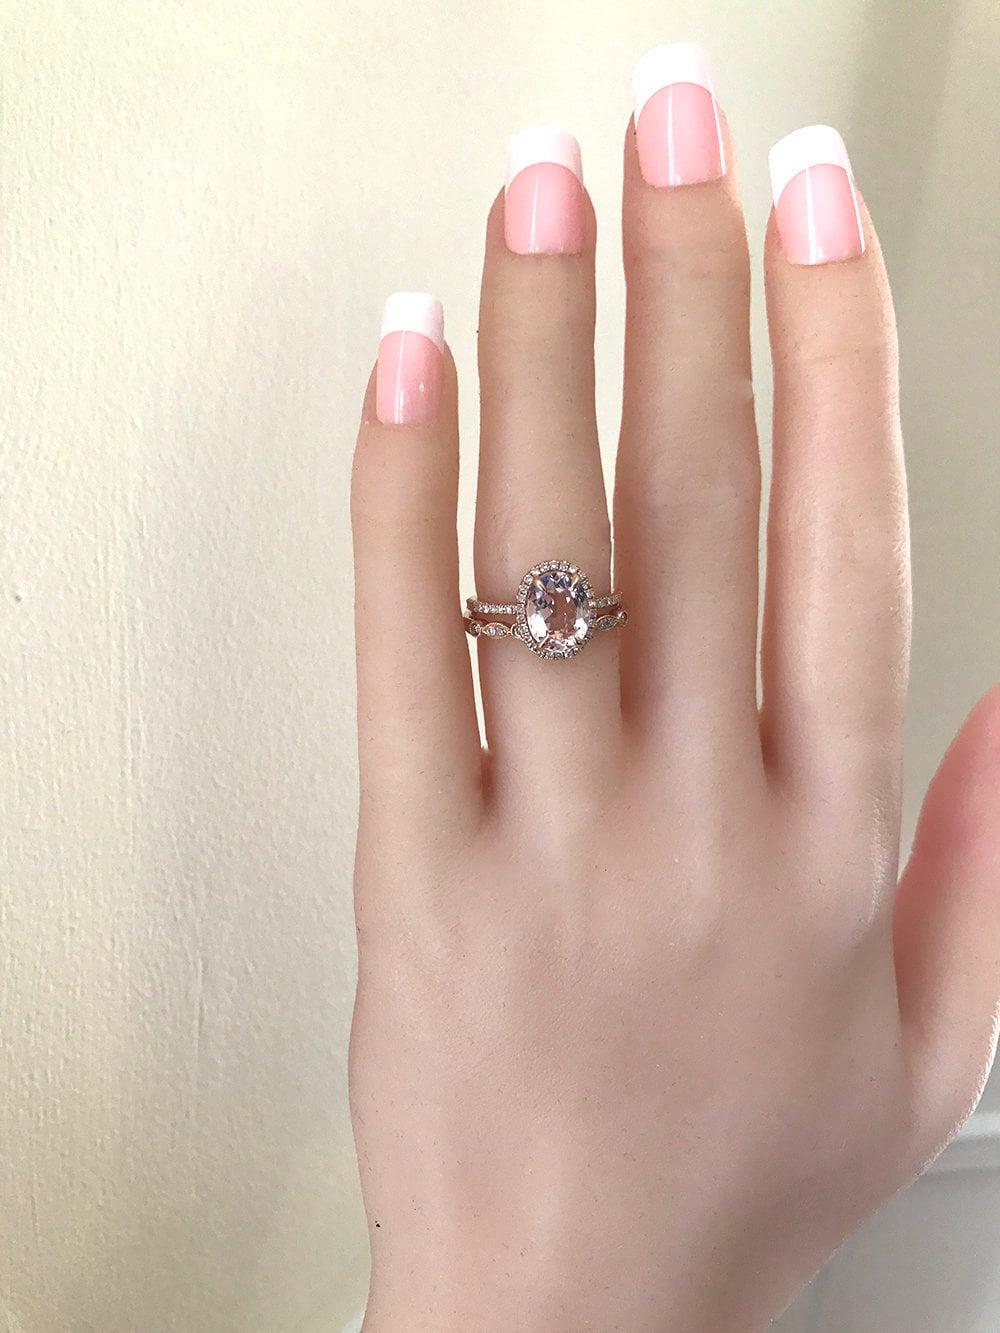 1.5ct Oval Morganite Engagement Ring Wedding Set Morganite